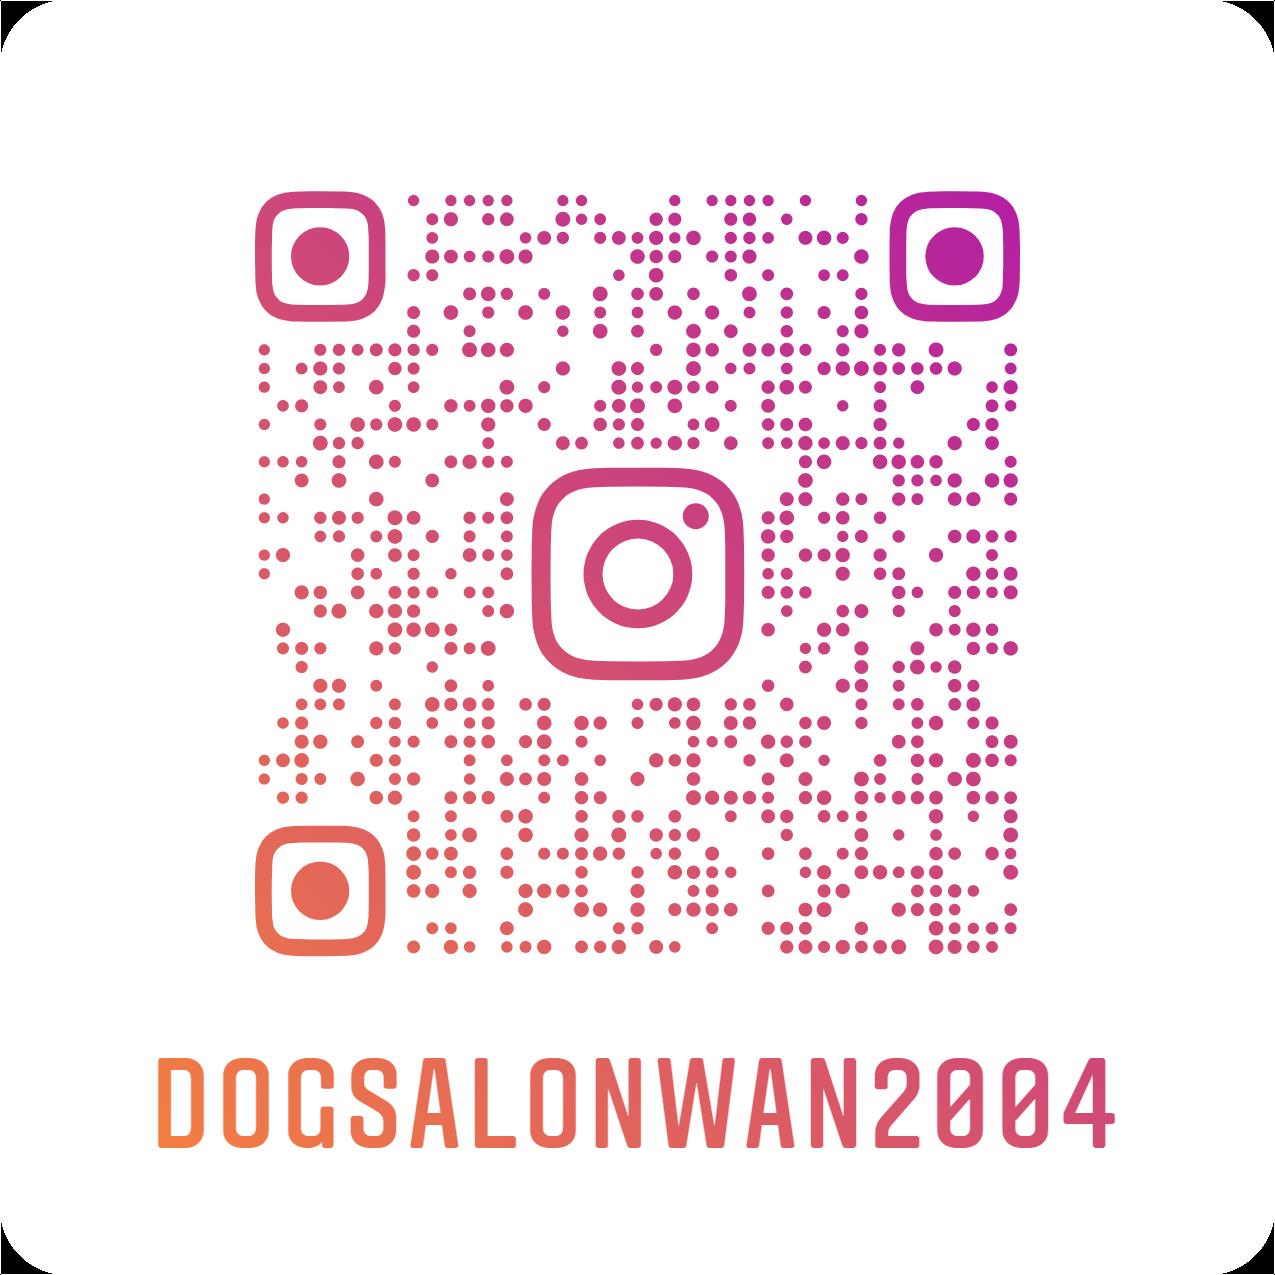 dogsalonwan2004_nametag_2021082913253586e_202109121341323db.png